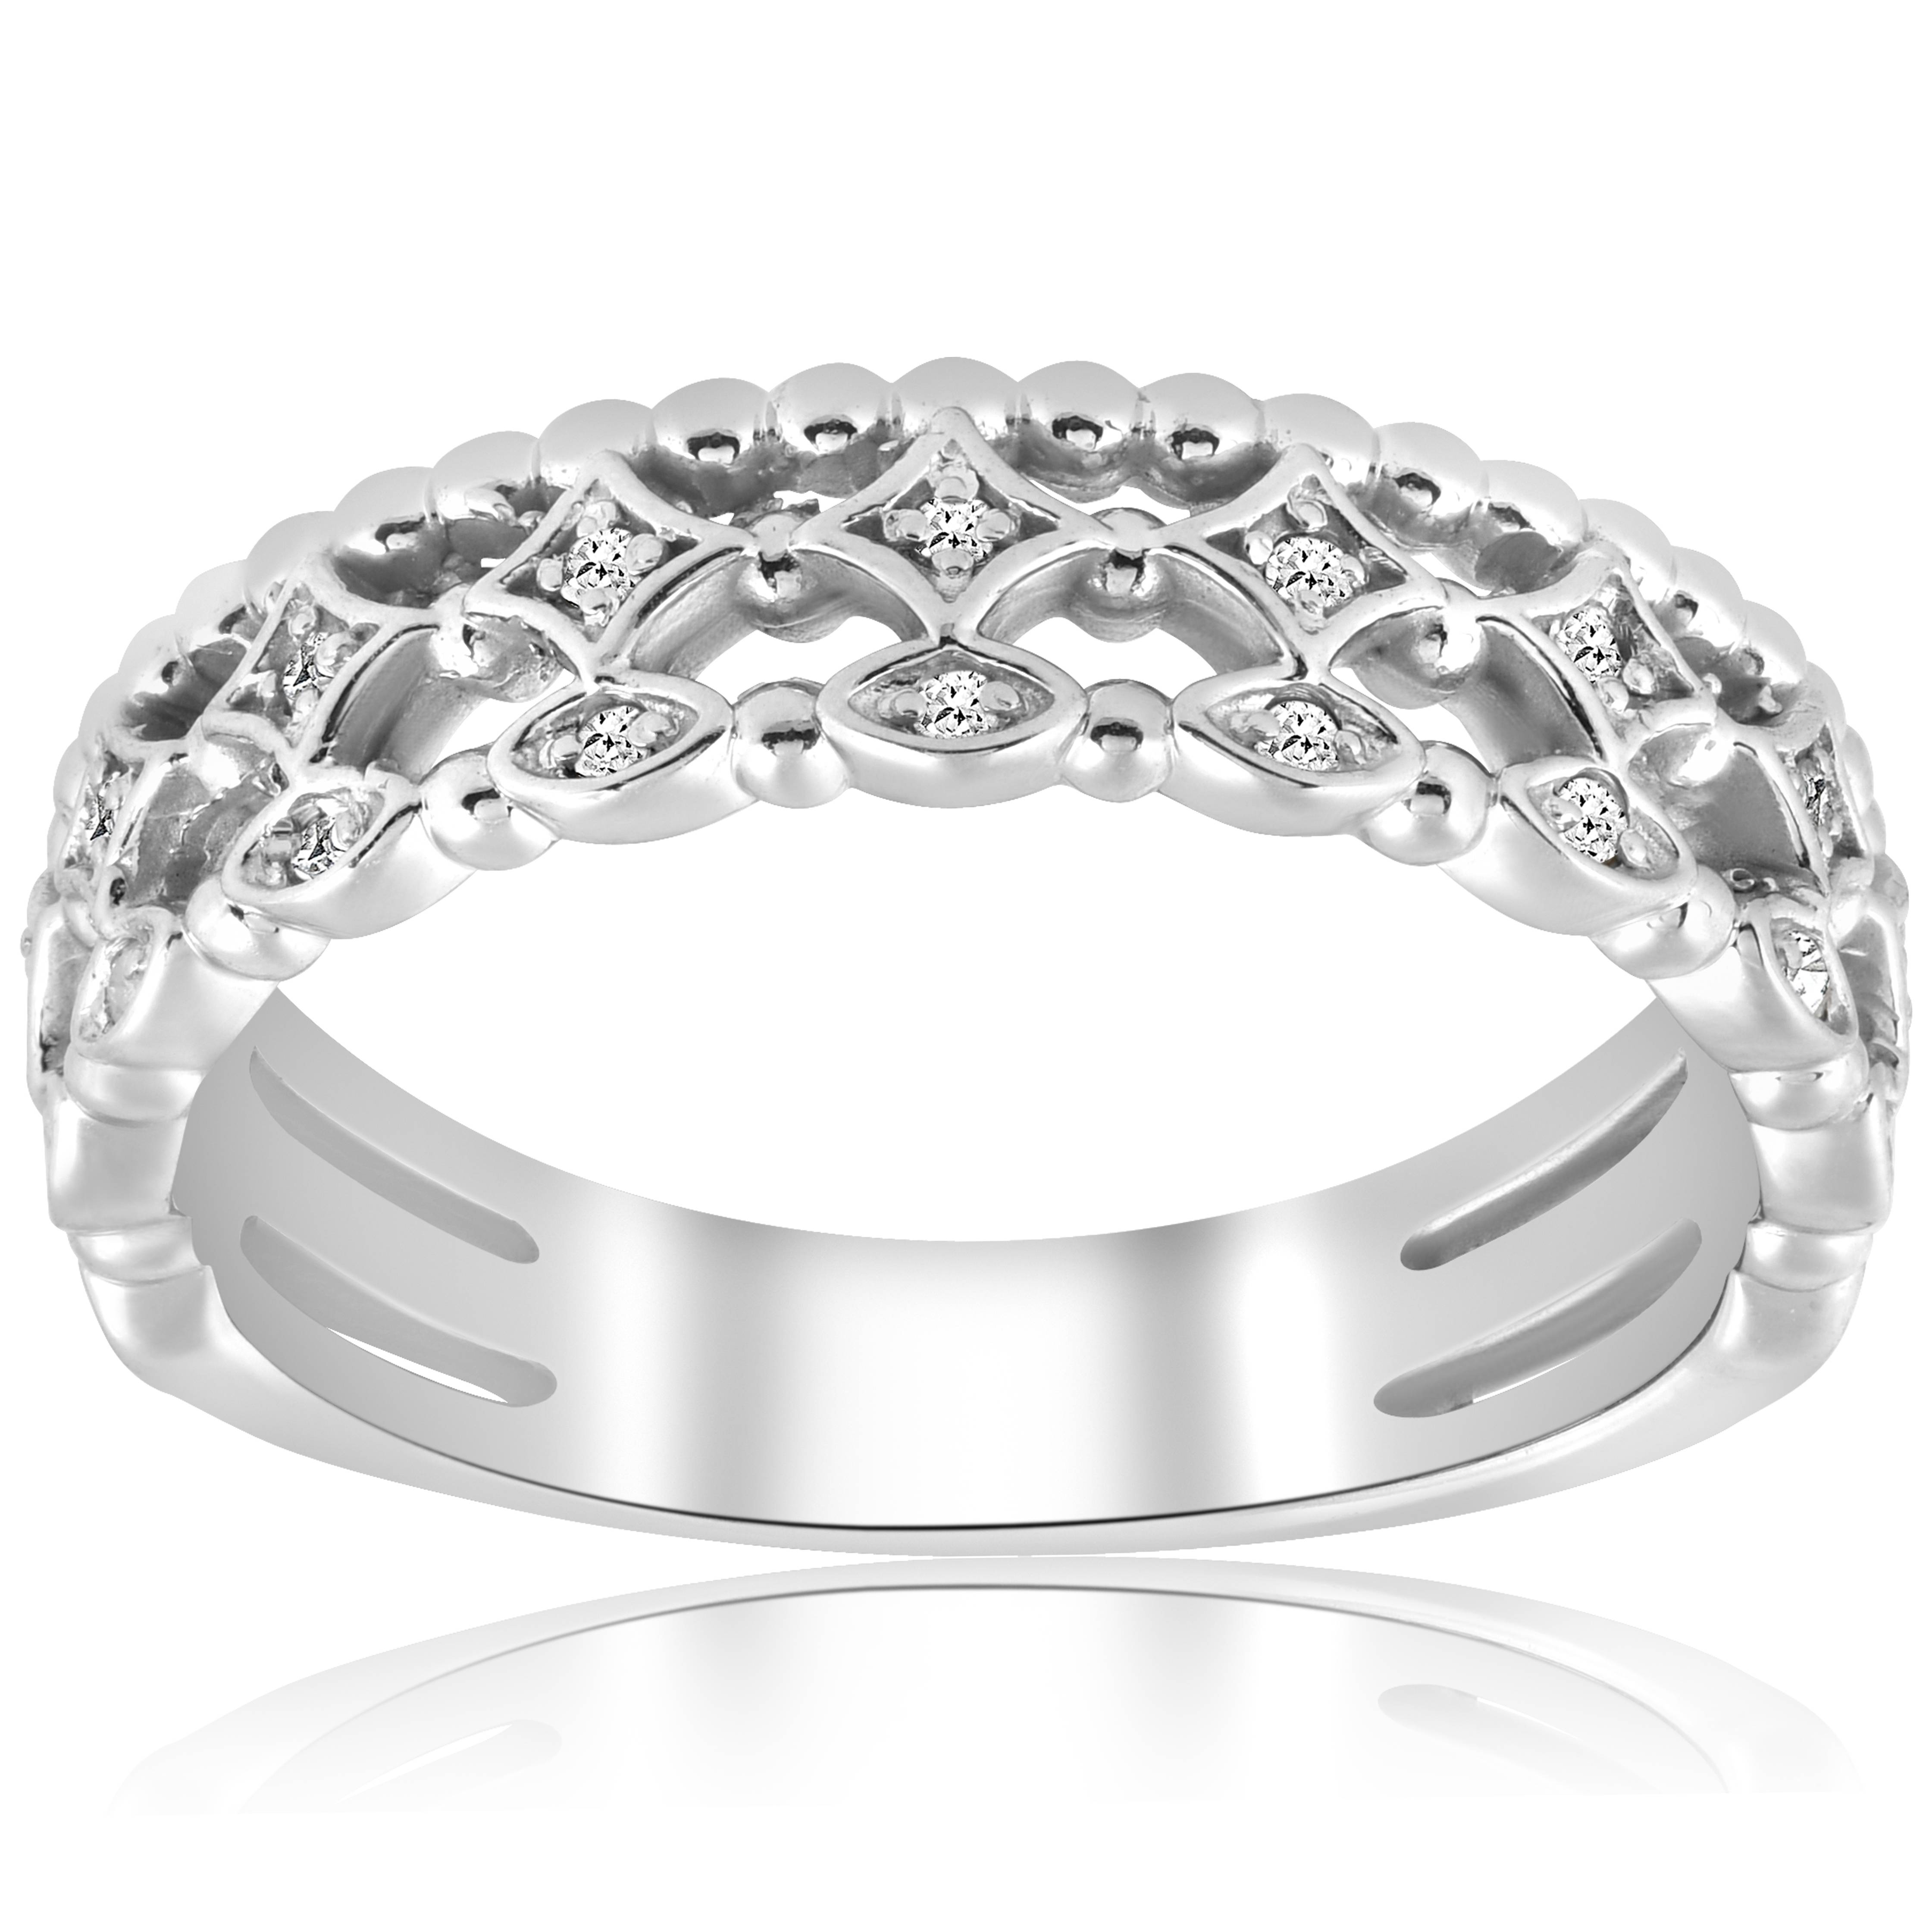 vintage diamond ring stackable white gold wedding ring. Black Bedroom Furniture Sets. Home Design Ideas